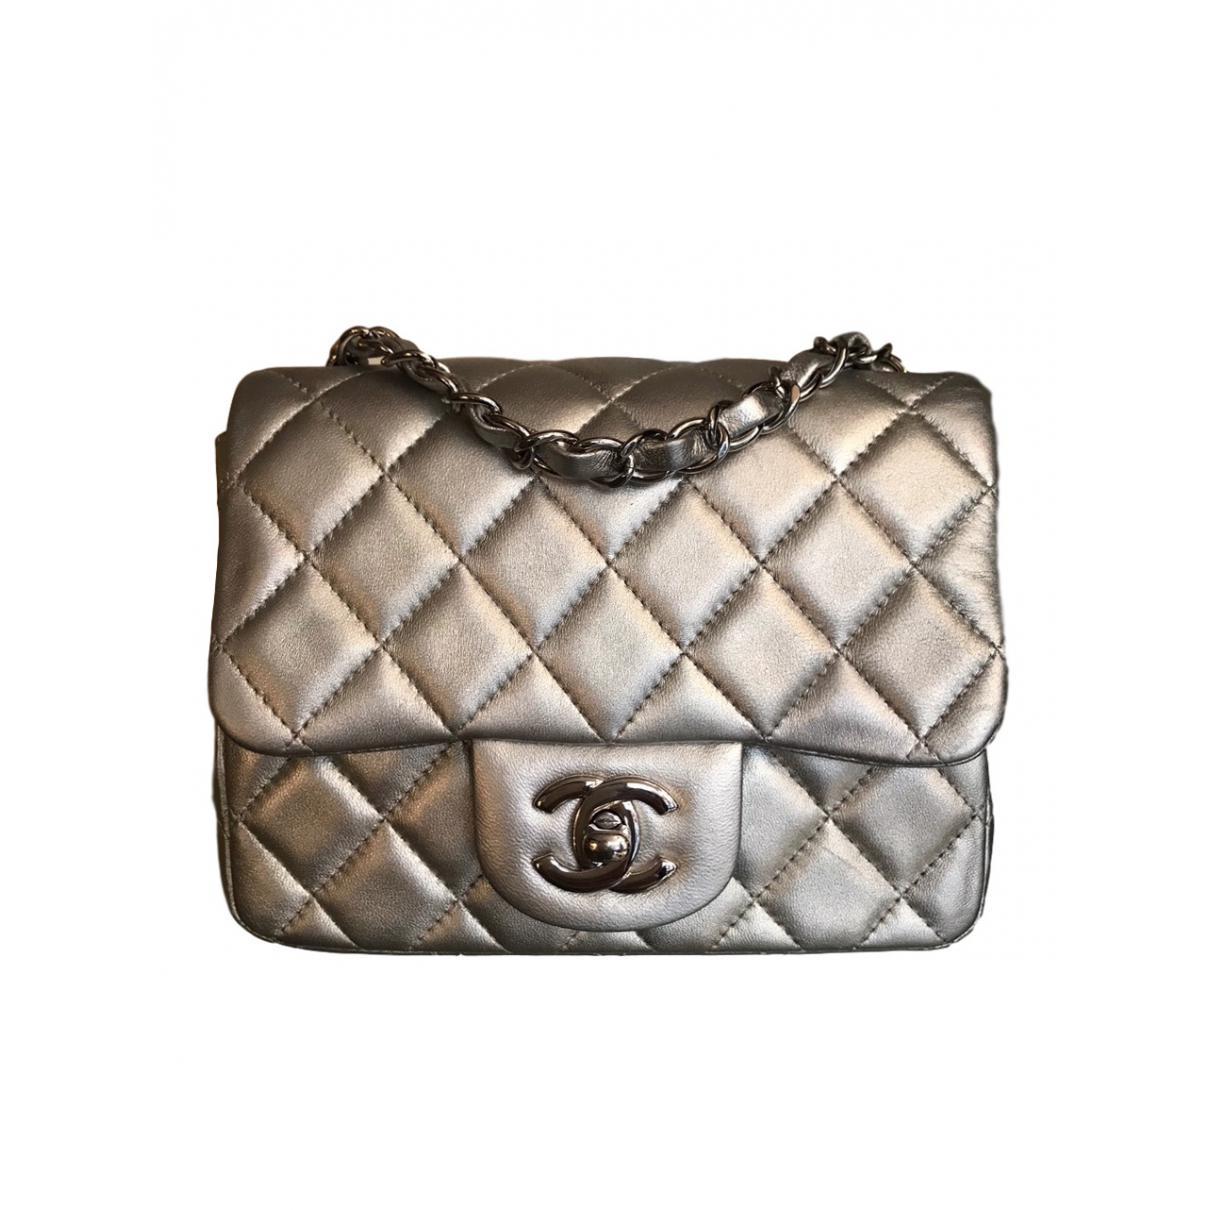 f416b873a047 Chanel. Women s Metallic Timeless Leather Handbag.  3